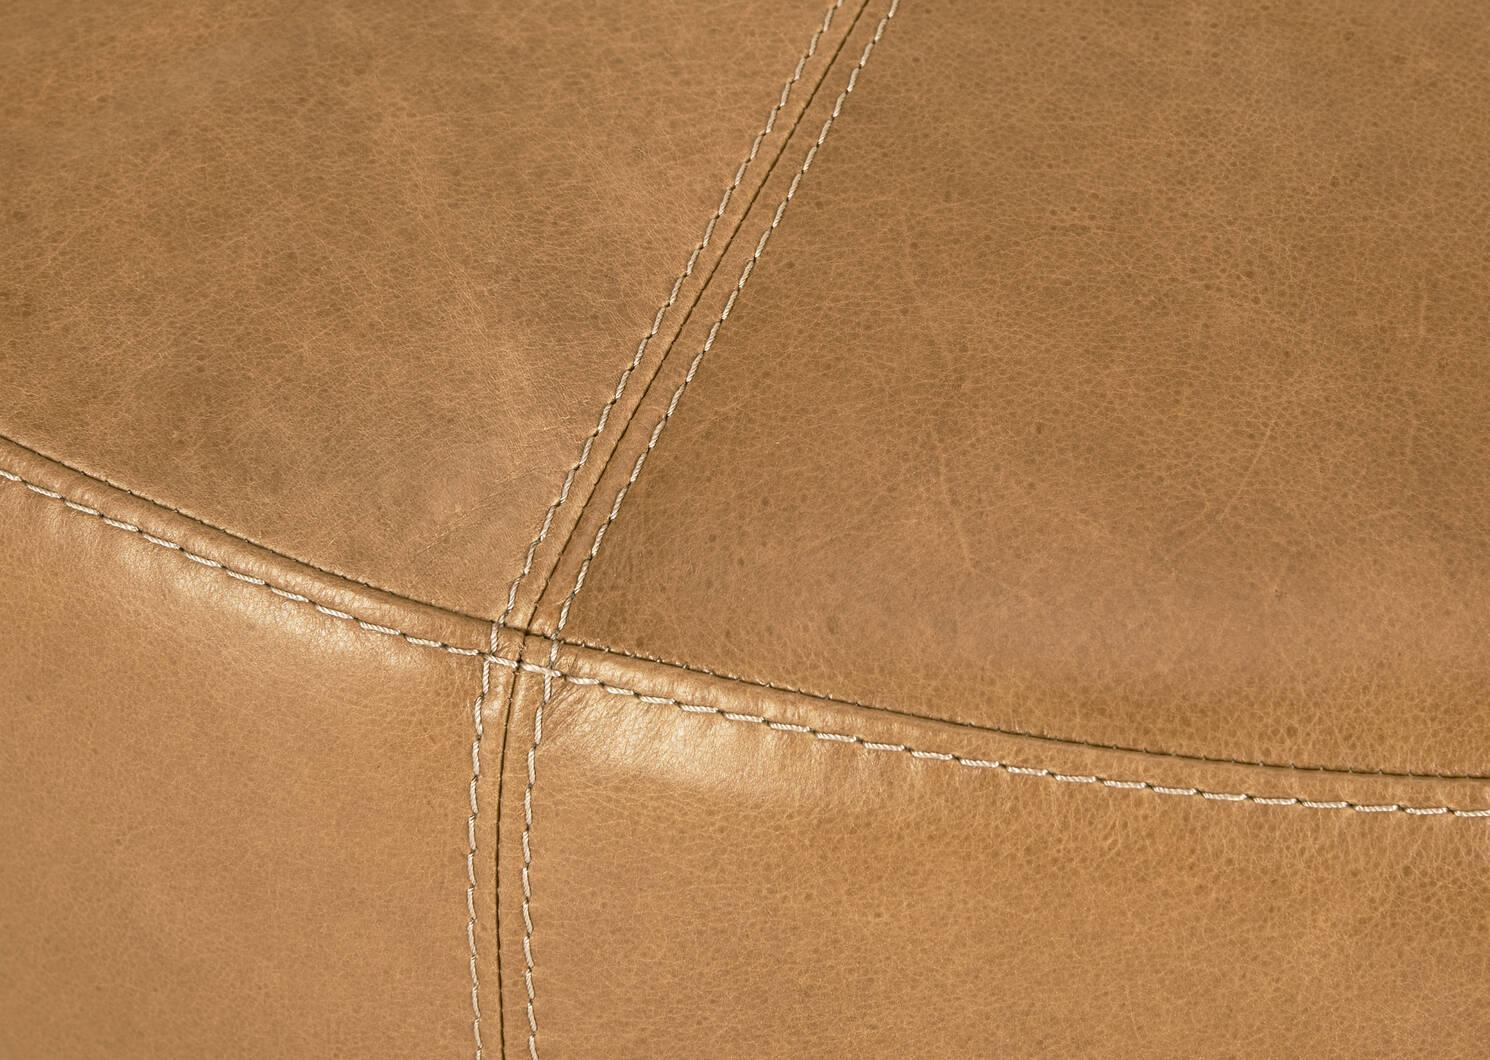 R-pieds cuir Archibald 36 -Adler brun cl